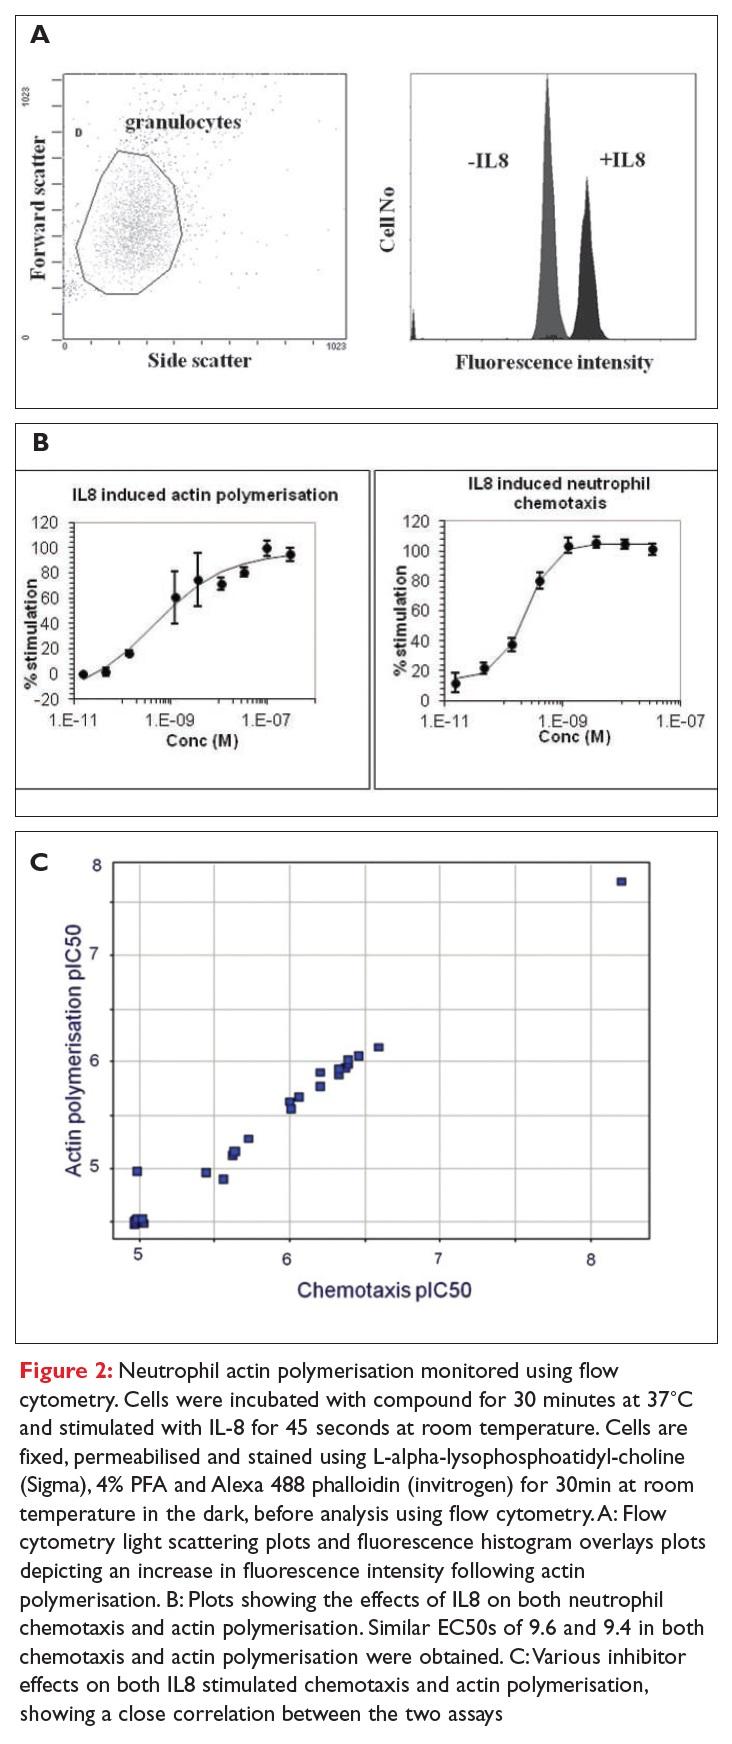 Figure 2 Neutrophil actin polymerisation monitored using flow cytometry